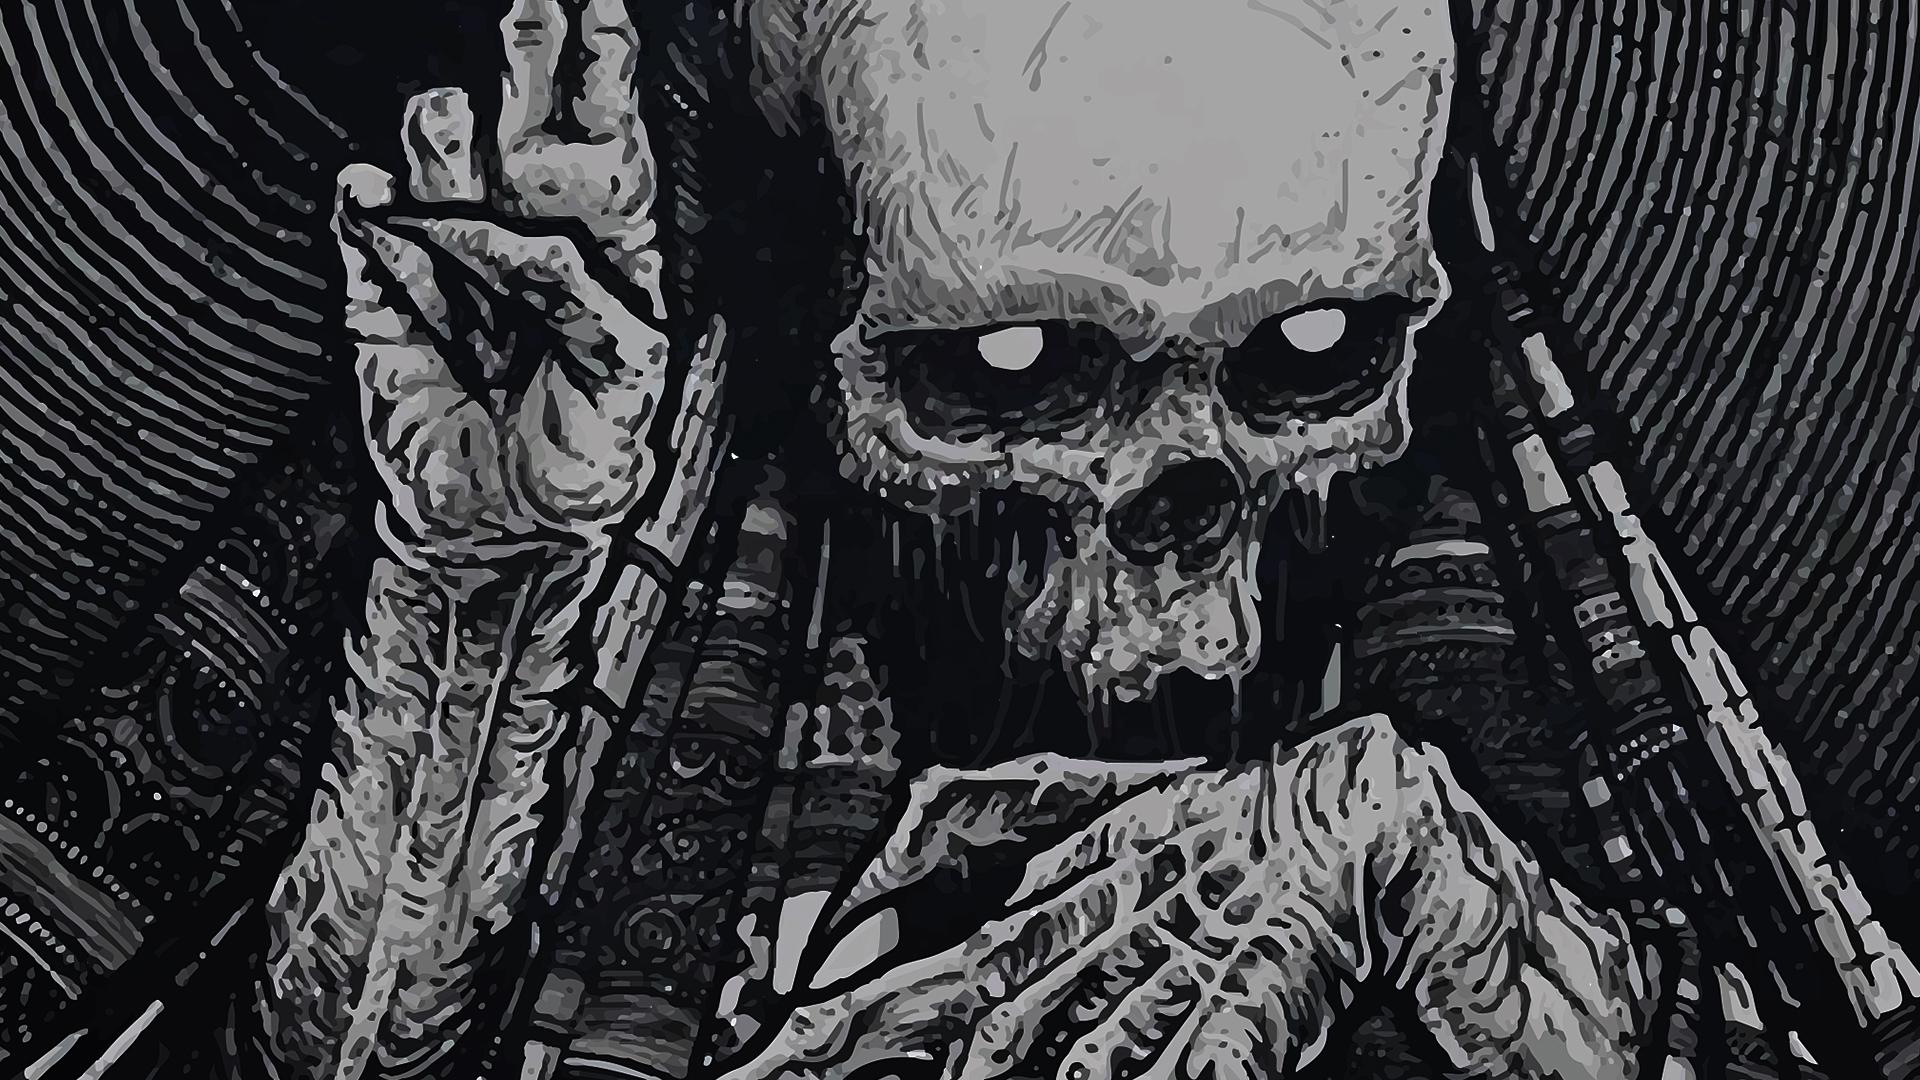 Scary skeleton wallpaper wallpapersafari - Scary skull backgrounds ...